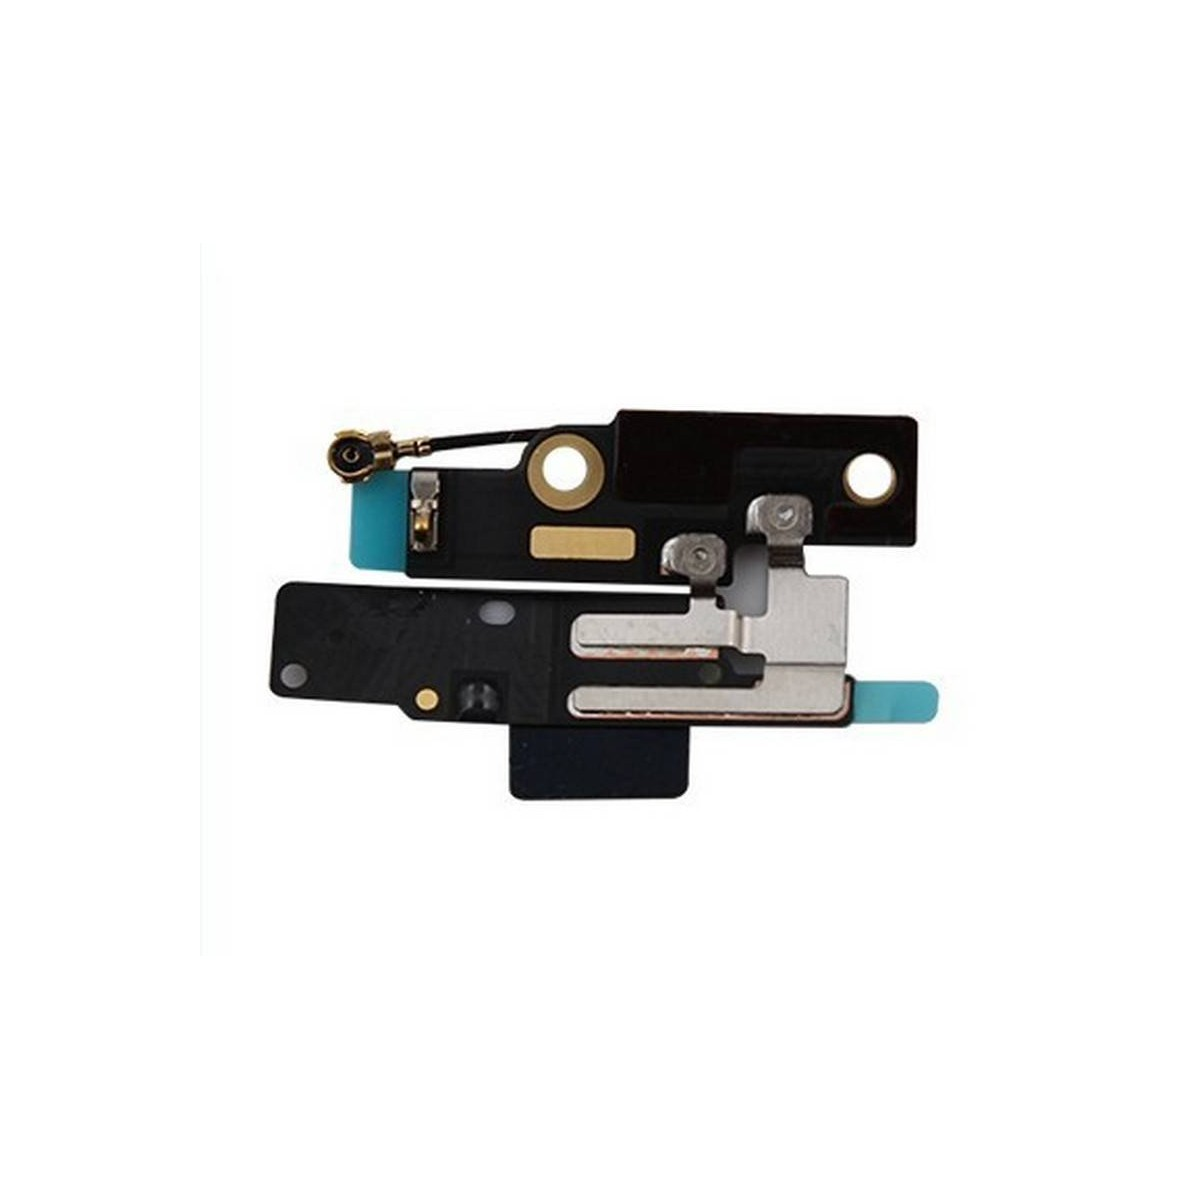 cable de antena wifi iphone 5c